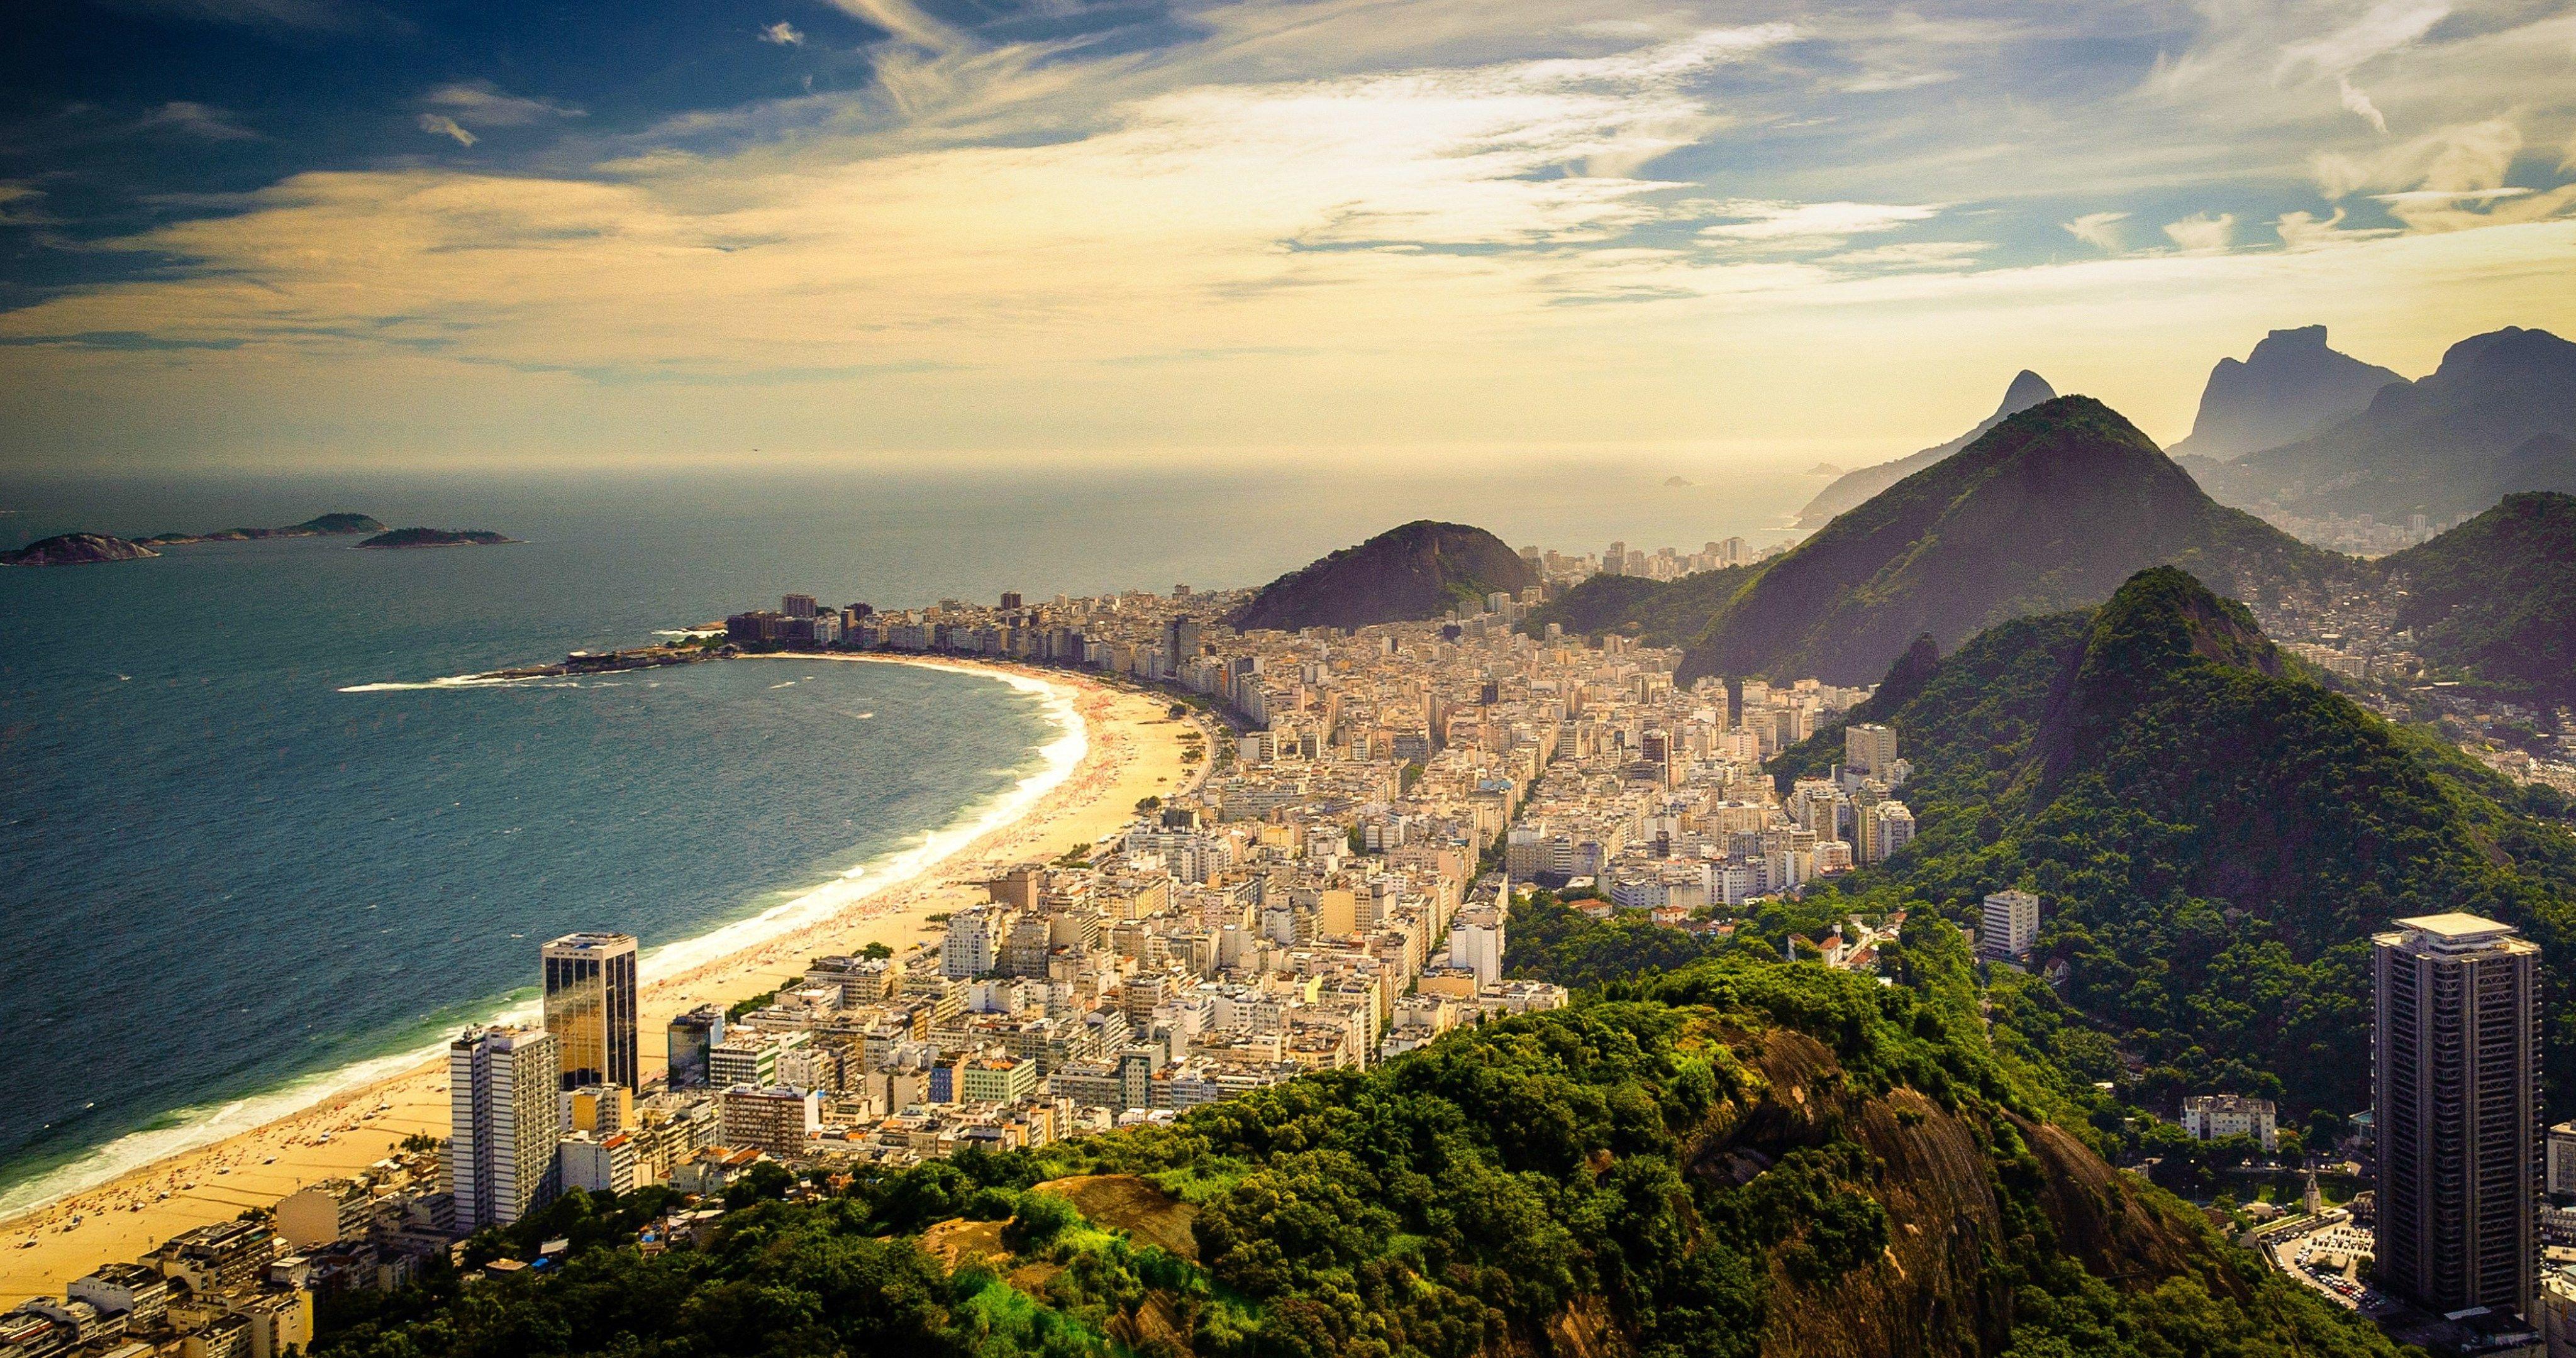 brazil wallpaper 1920x1080